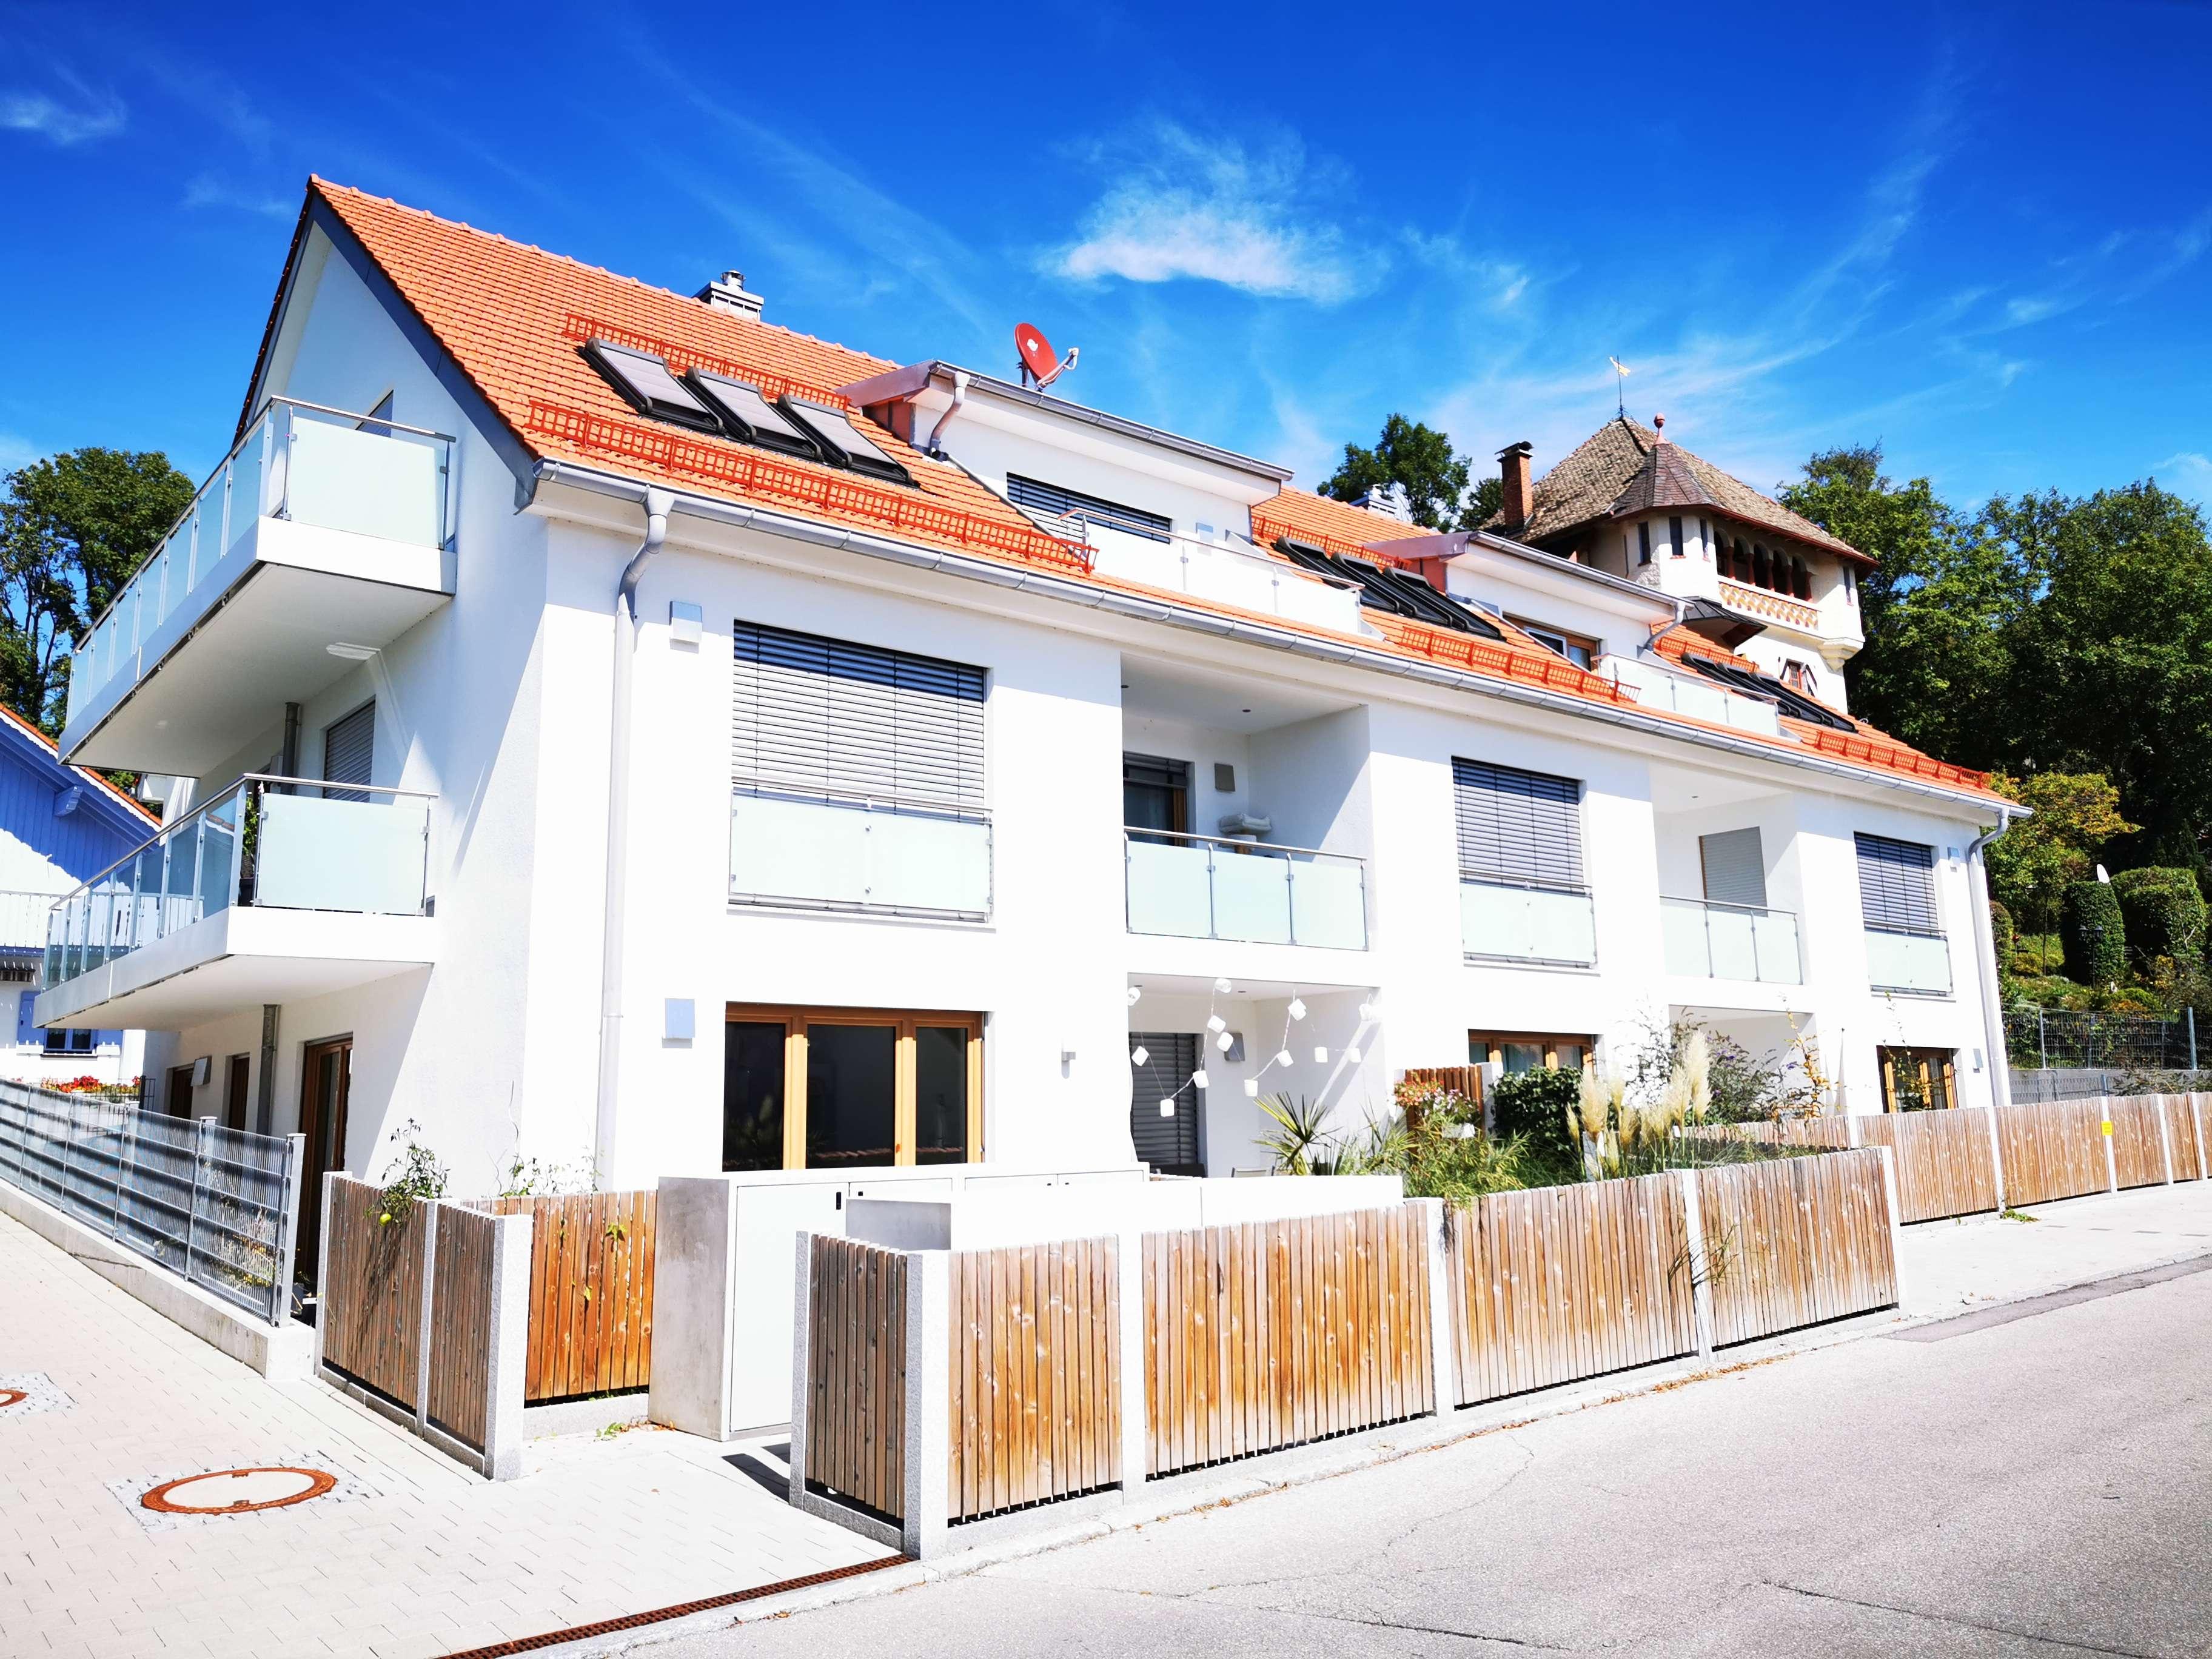 Exklusive 4-Zimmer-Wohnung in Wörthsee in Wörthsee